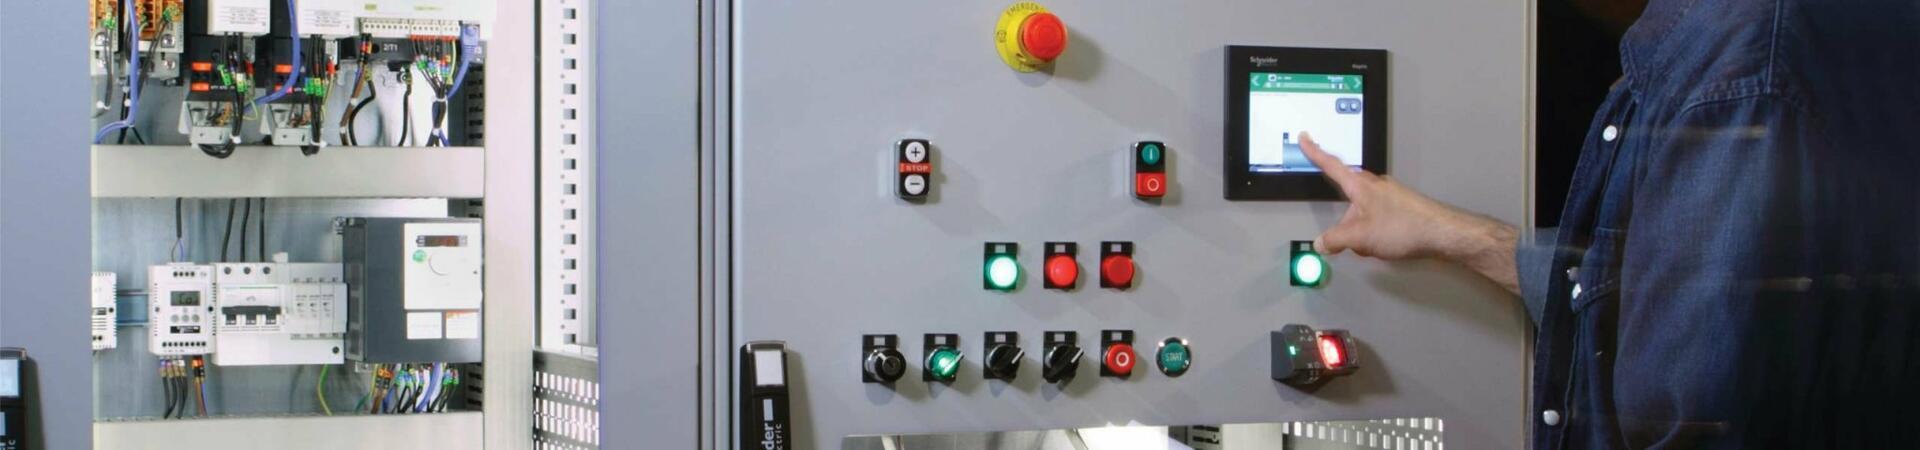 ControlPanel001-2560x600